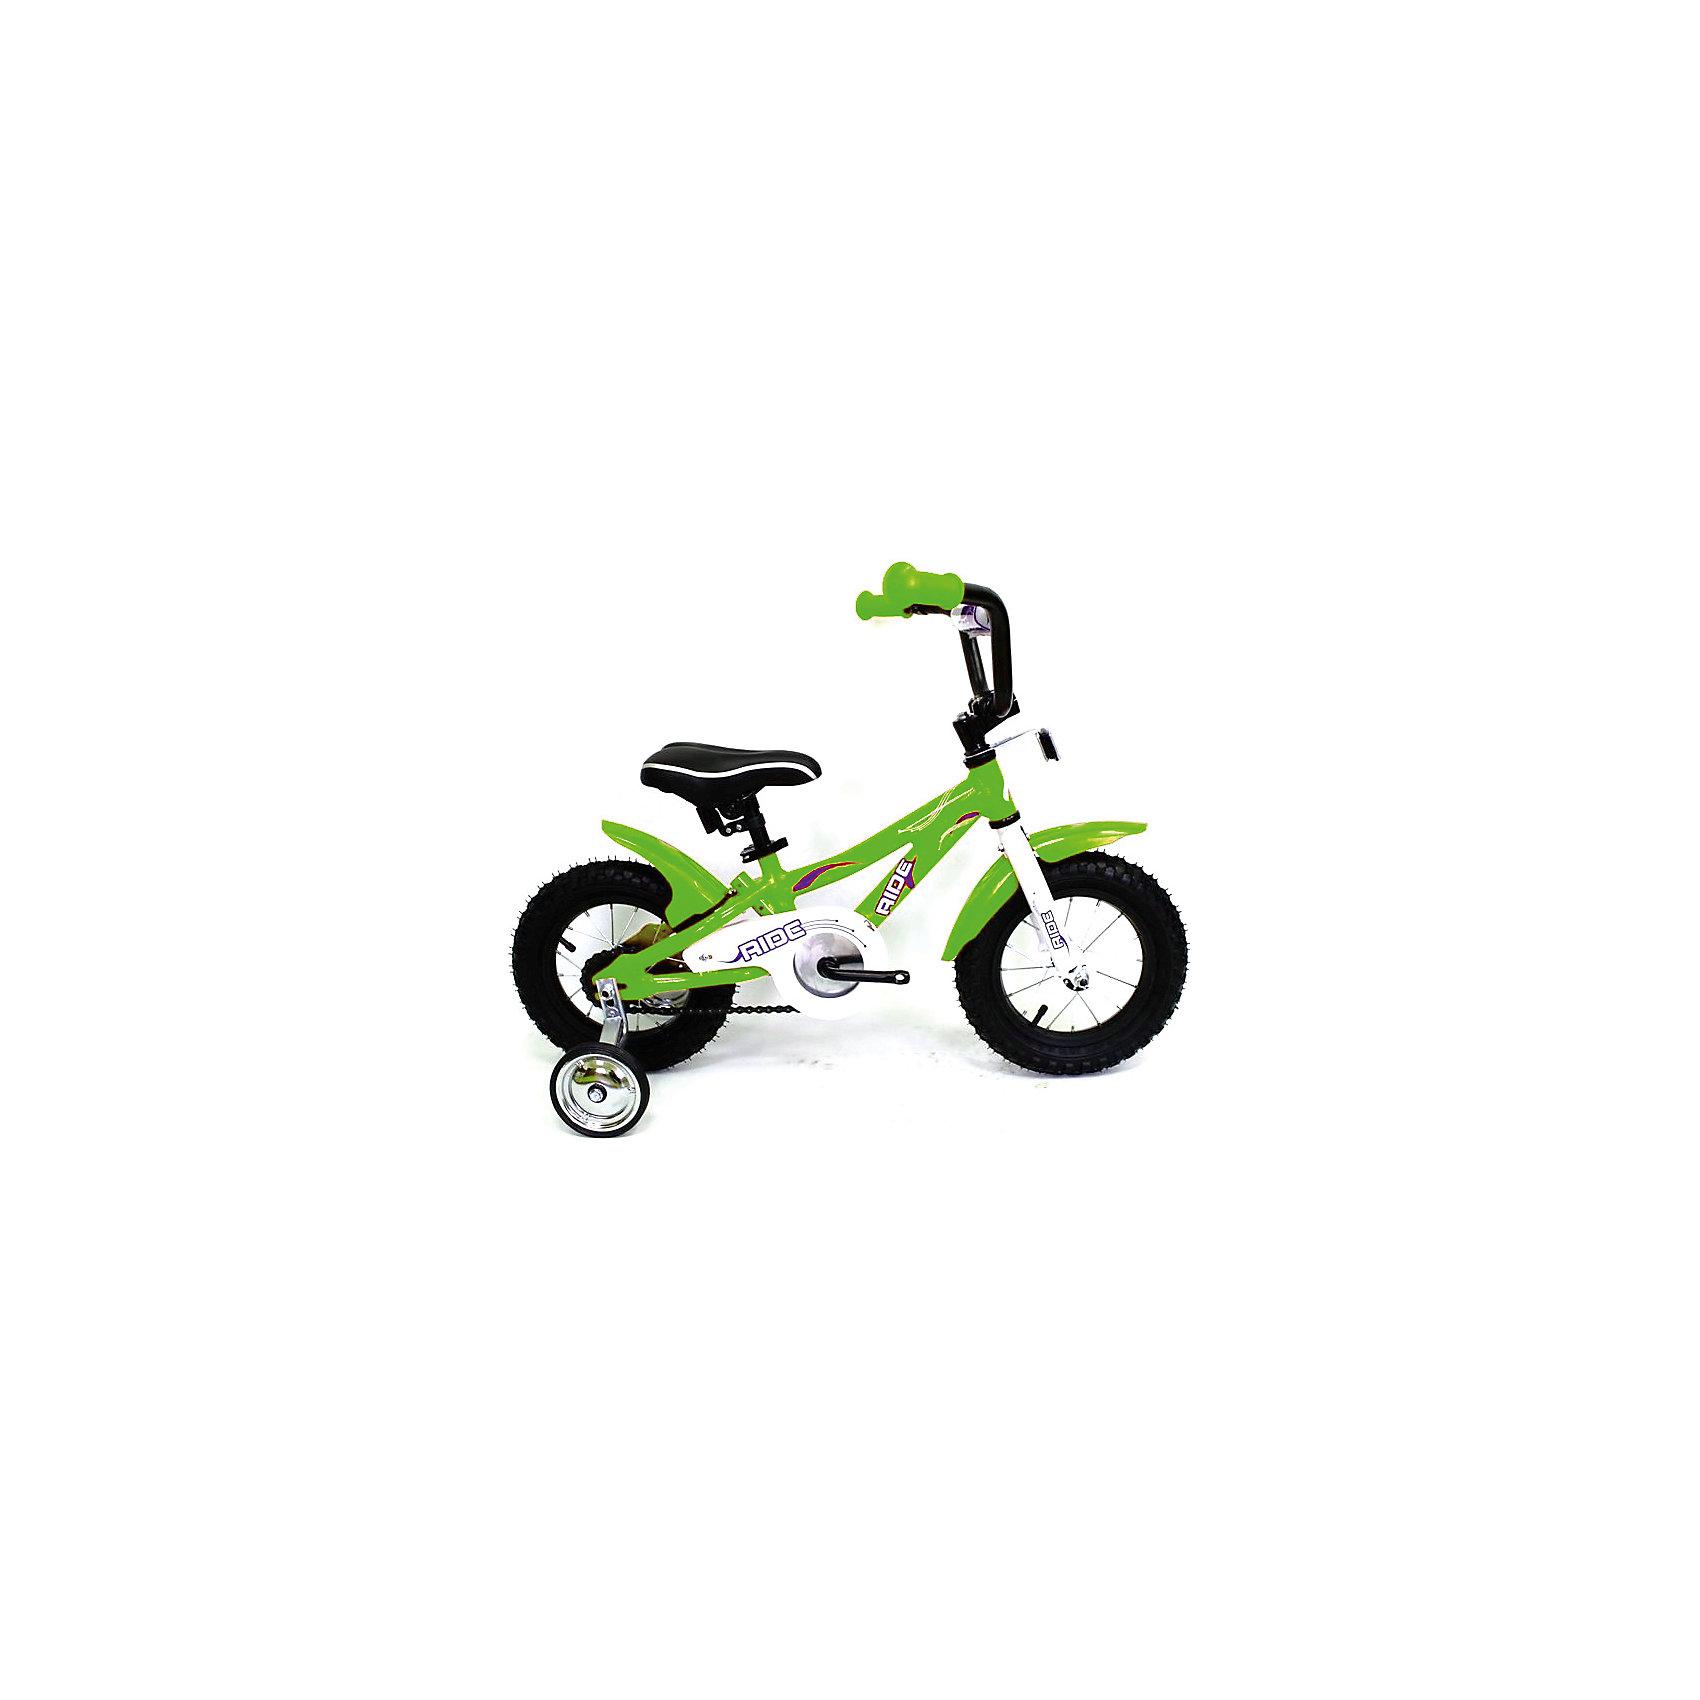 Велосипед RIDE, MARS, светло-зеленый<br><br>Ширина мм: 400<br>Глубина мм: 400<br>Высота мм: 1000<br>Вес г: 10000<br>Возраст от месяцев: 24<br>Возраст до месяцев: 60<br>Пол: Унисекс<br>Возраст: Детский<br>SKU: 4785499